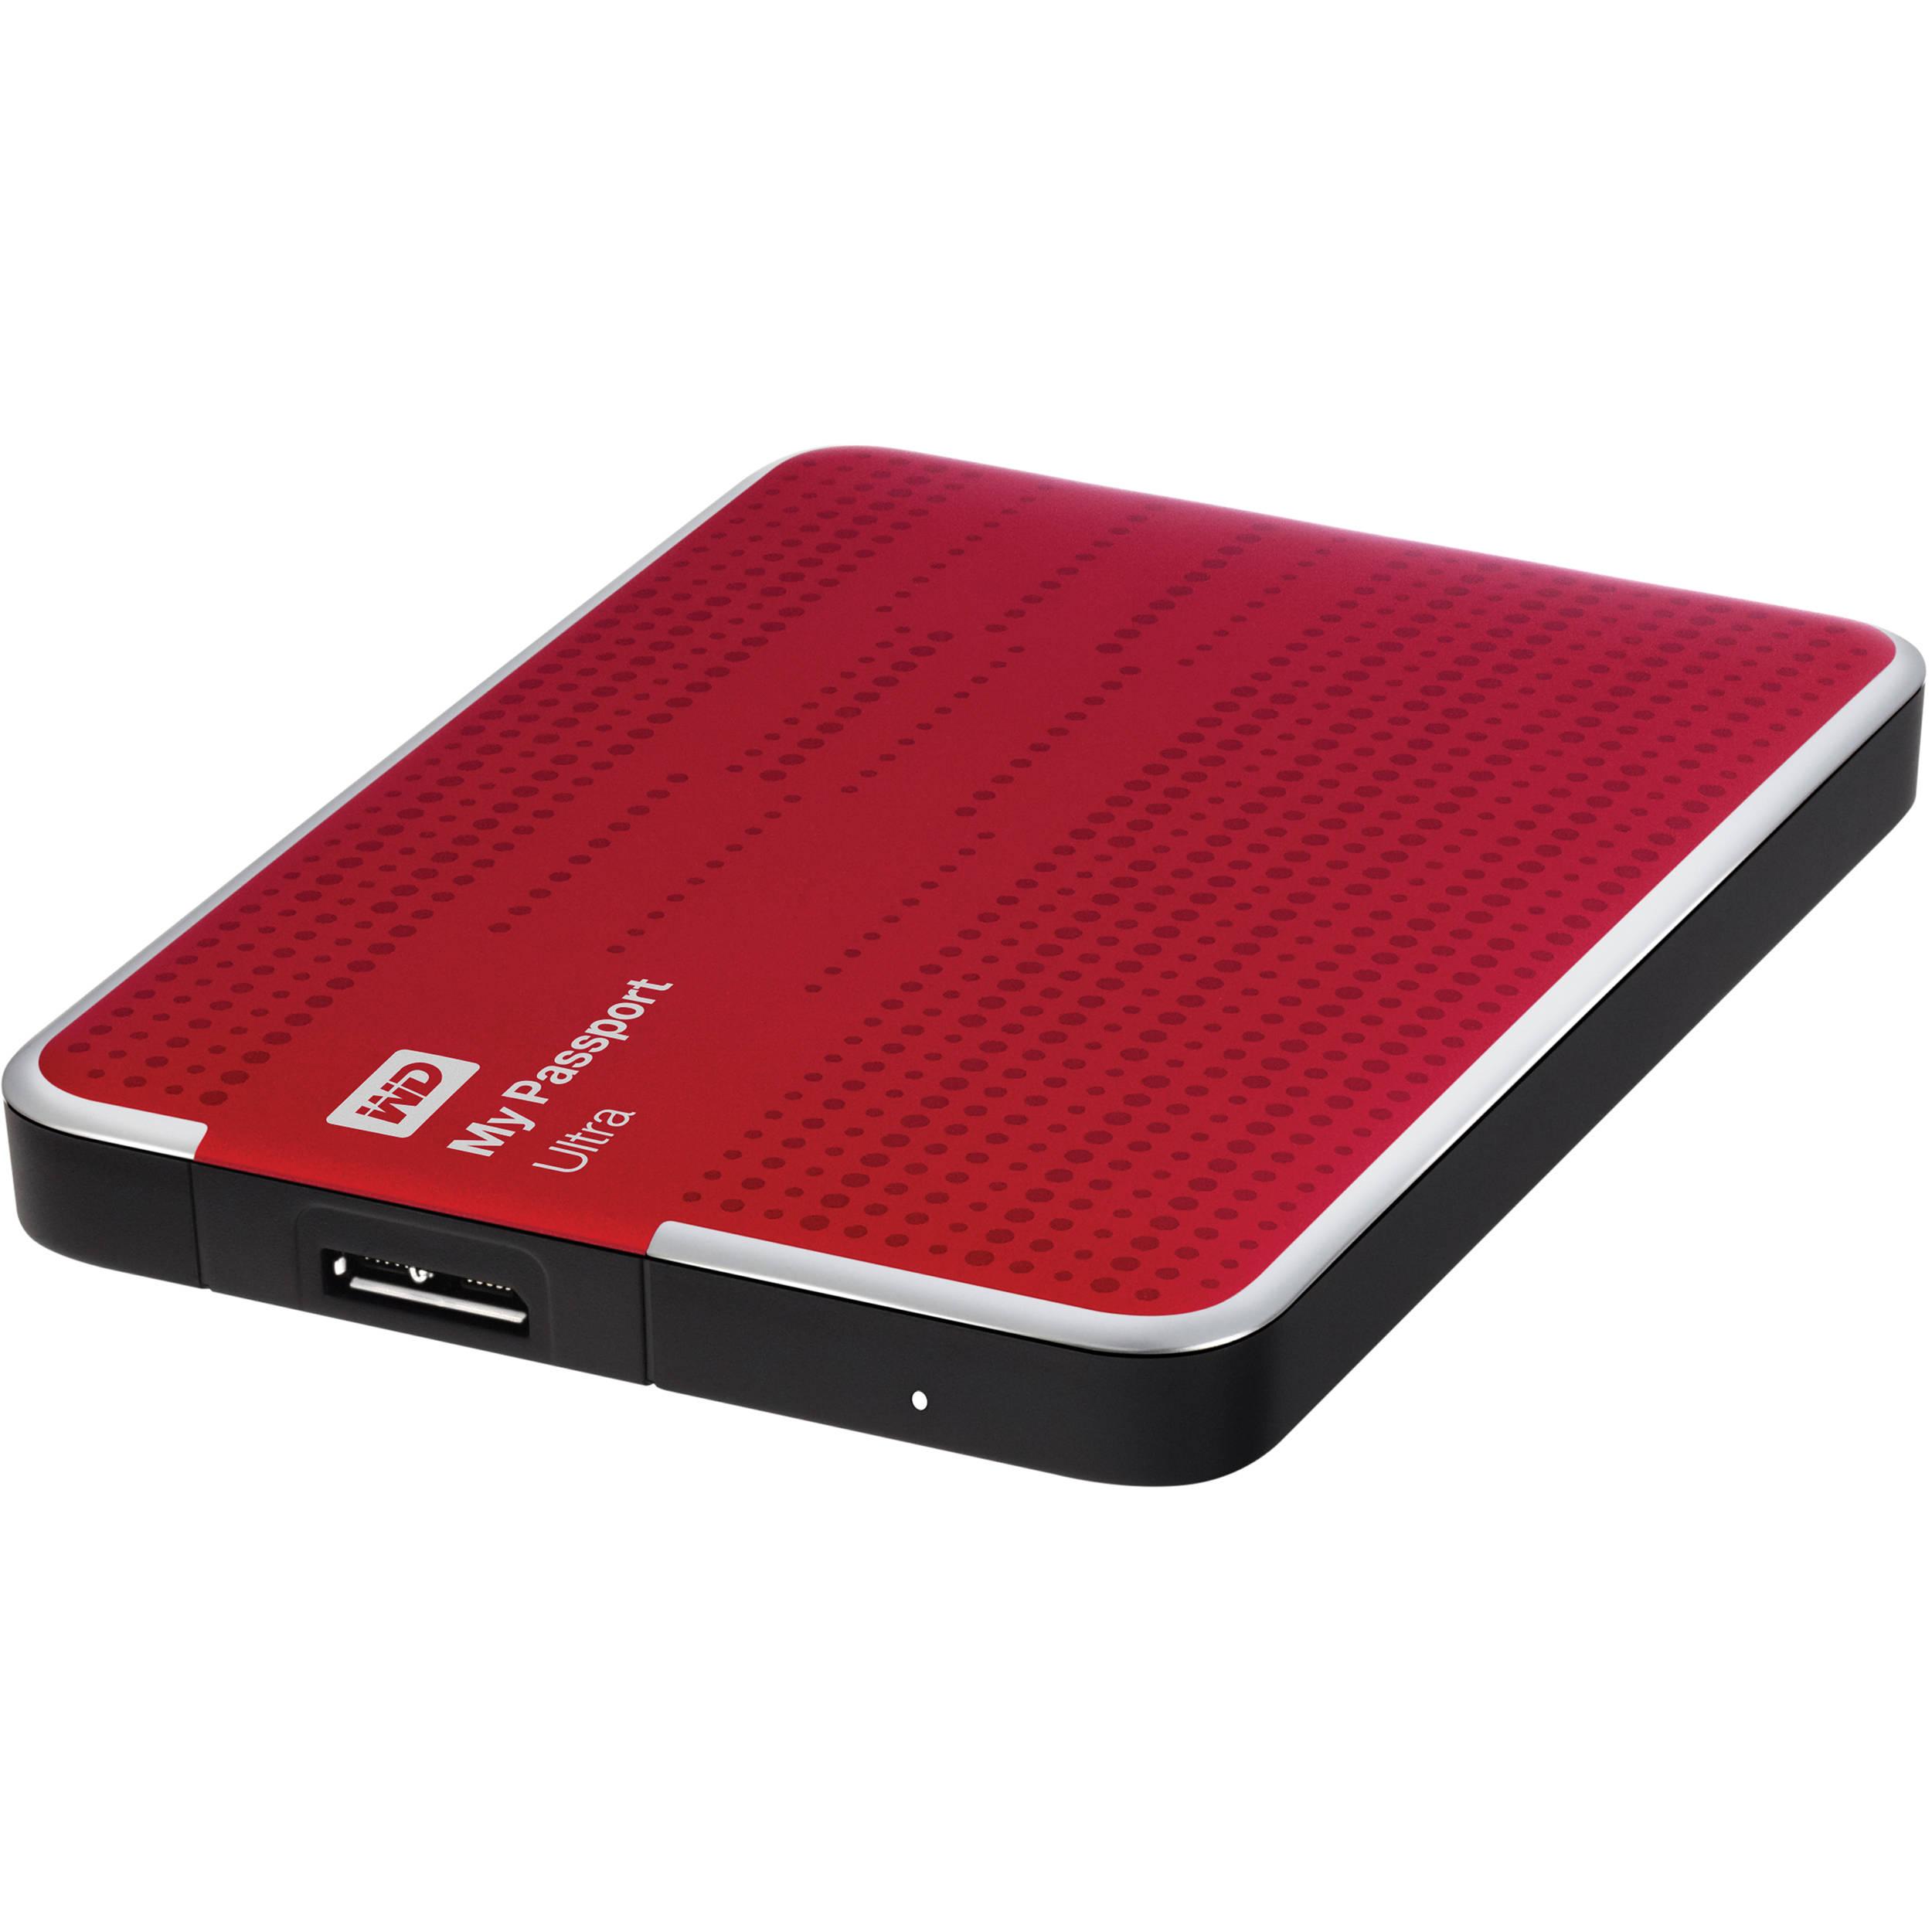 WD 500GB My Passport Ultra Portable Hard Drive (Red)